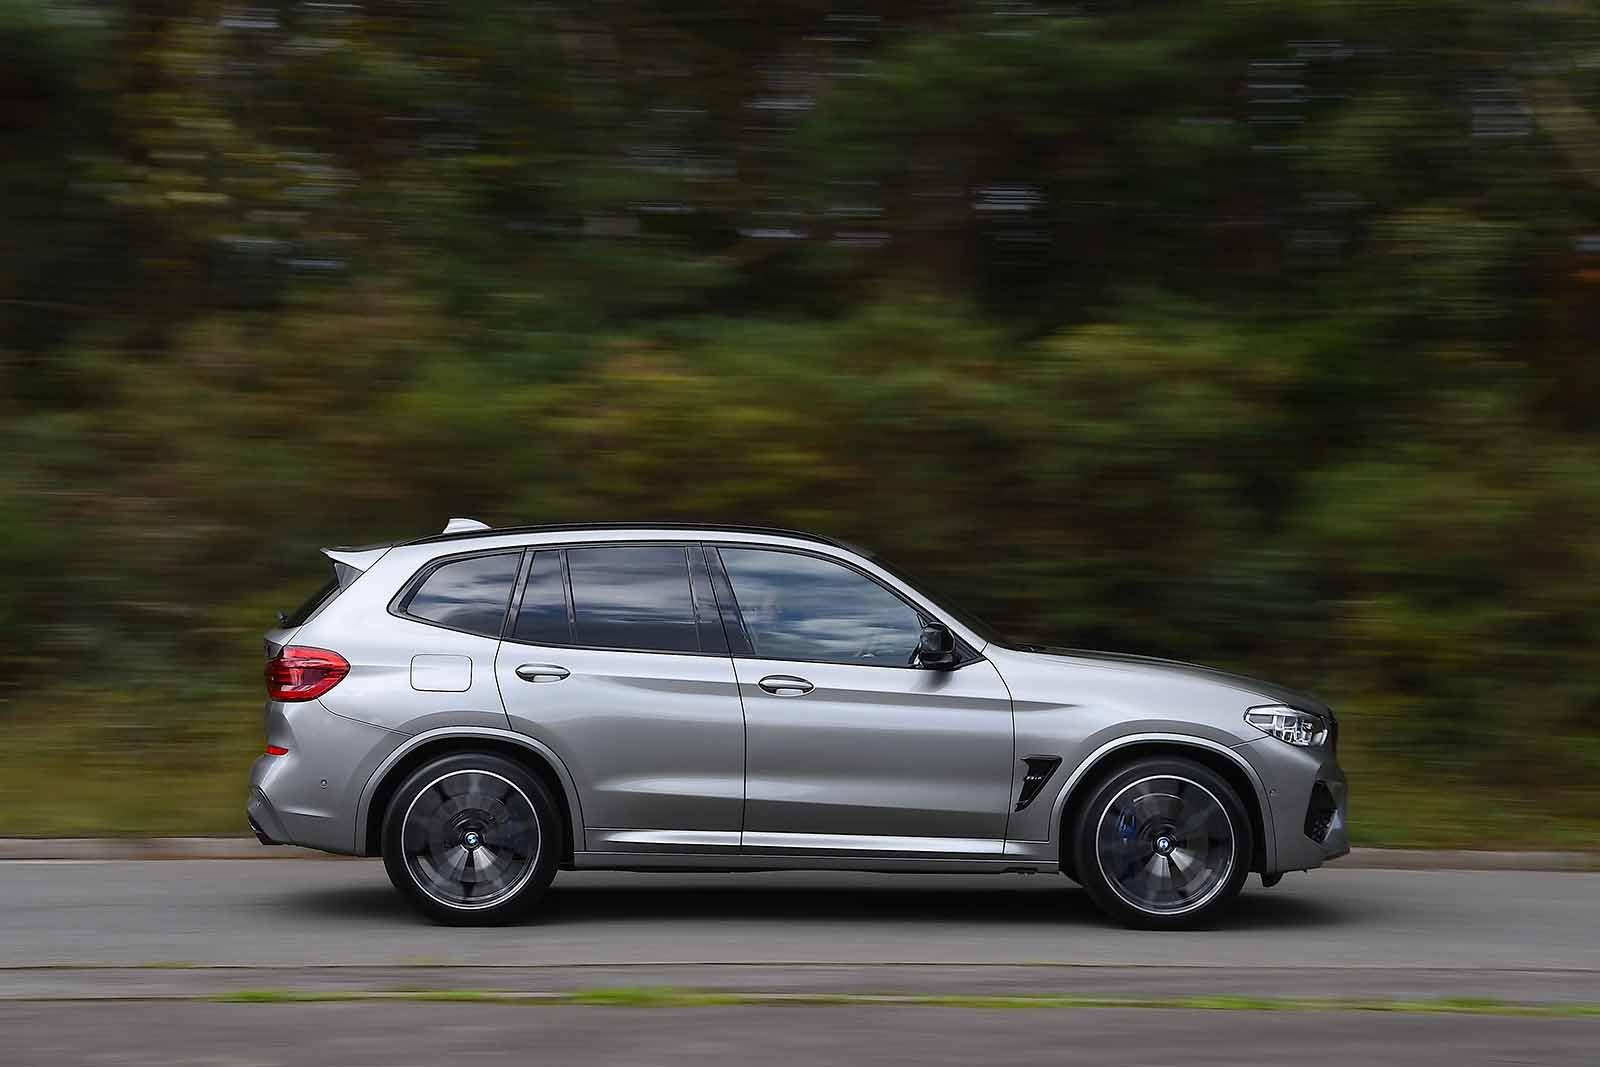 BMW X3 M 2019 RHD right panning